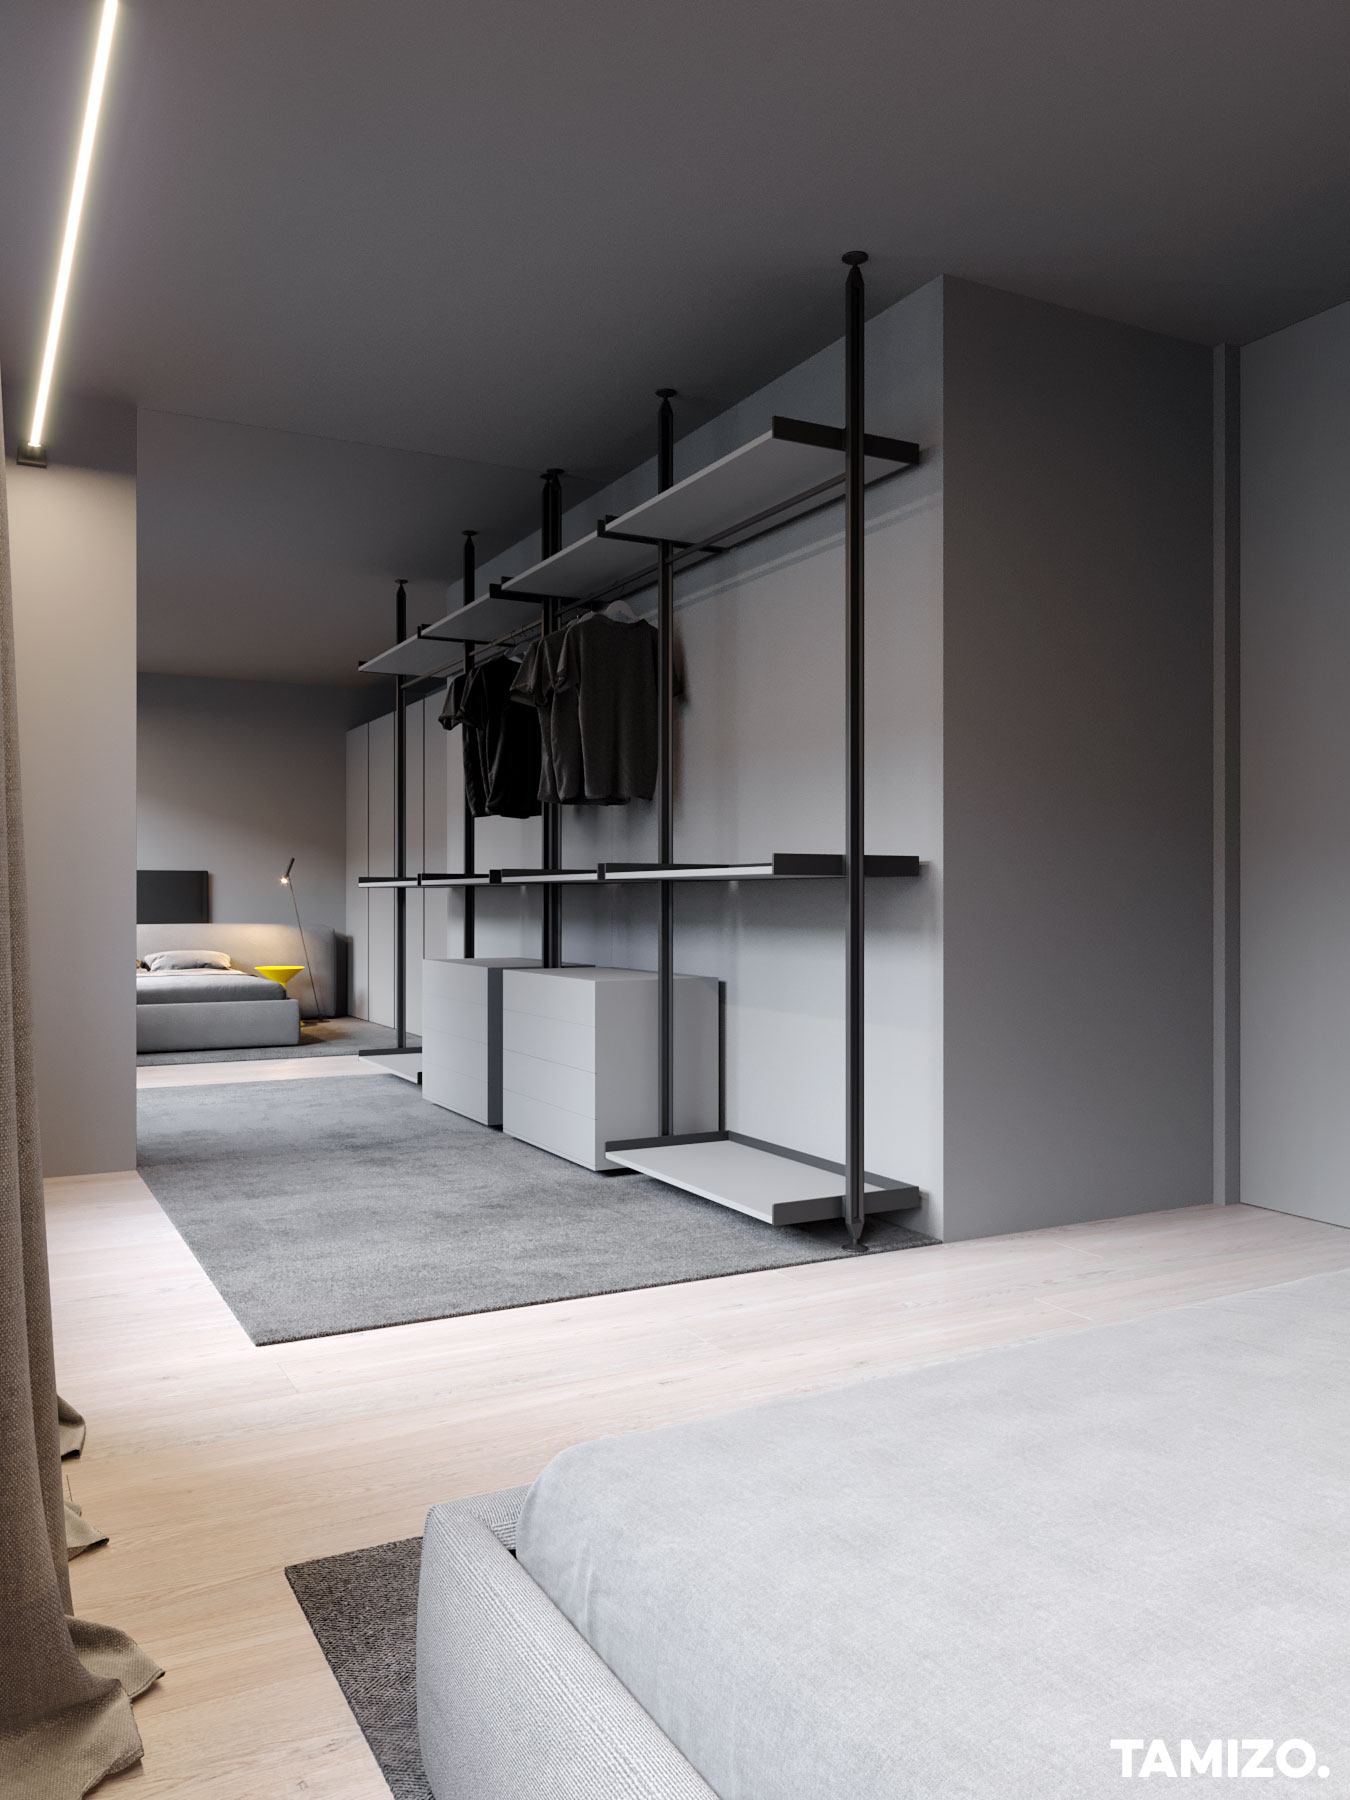 tamizo_interior_wnetrza_projekt_architekci_mateusz_kuo_stolarski_lodz_14